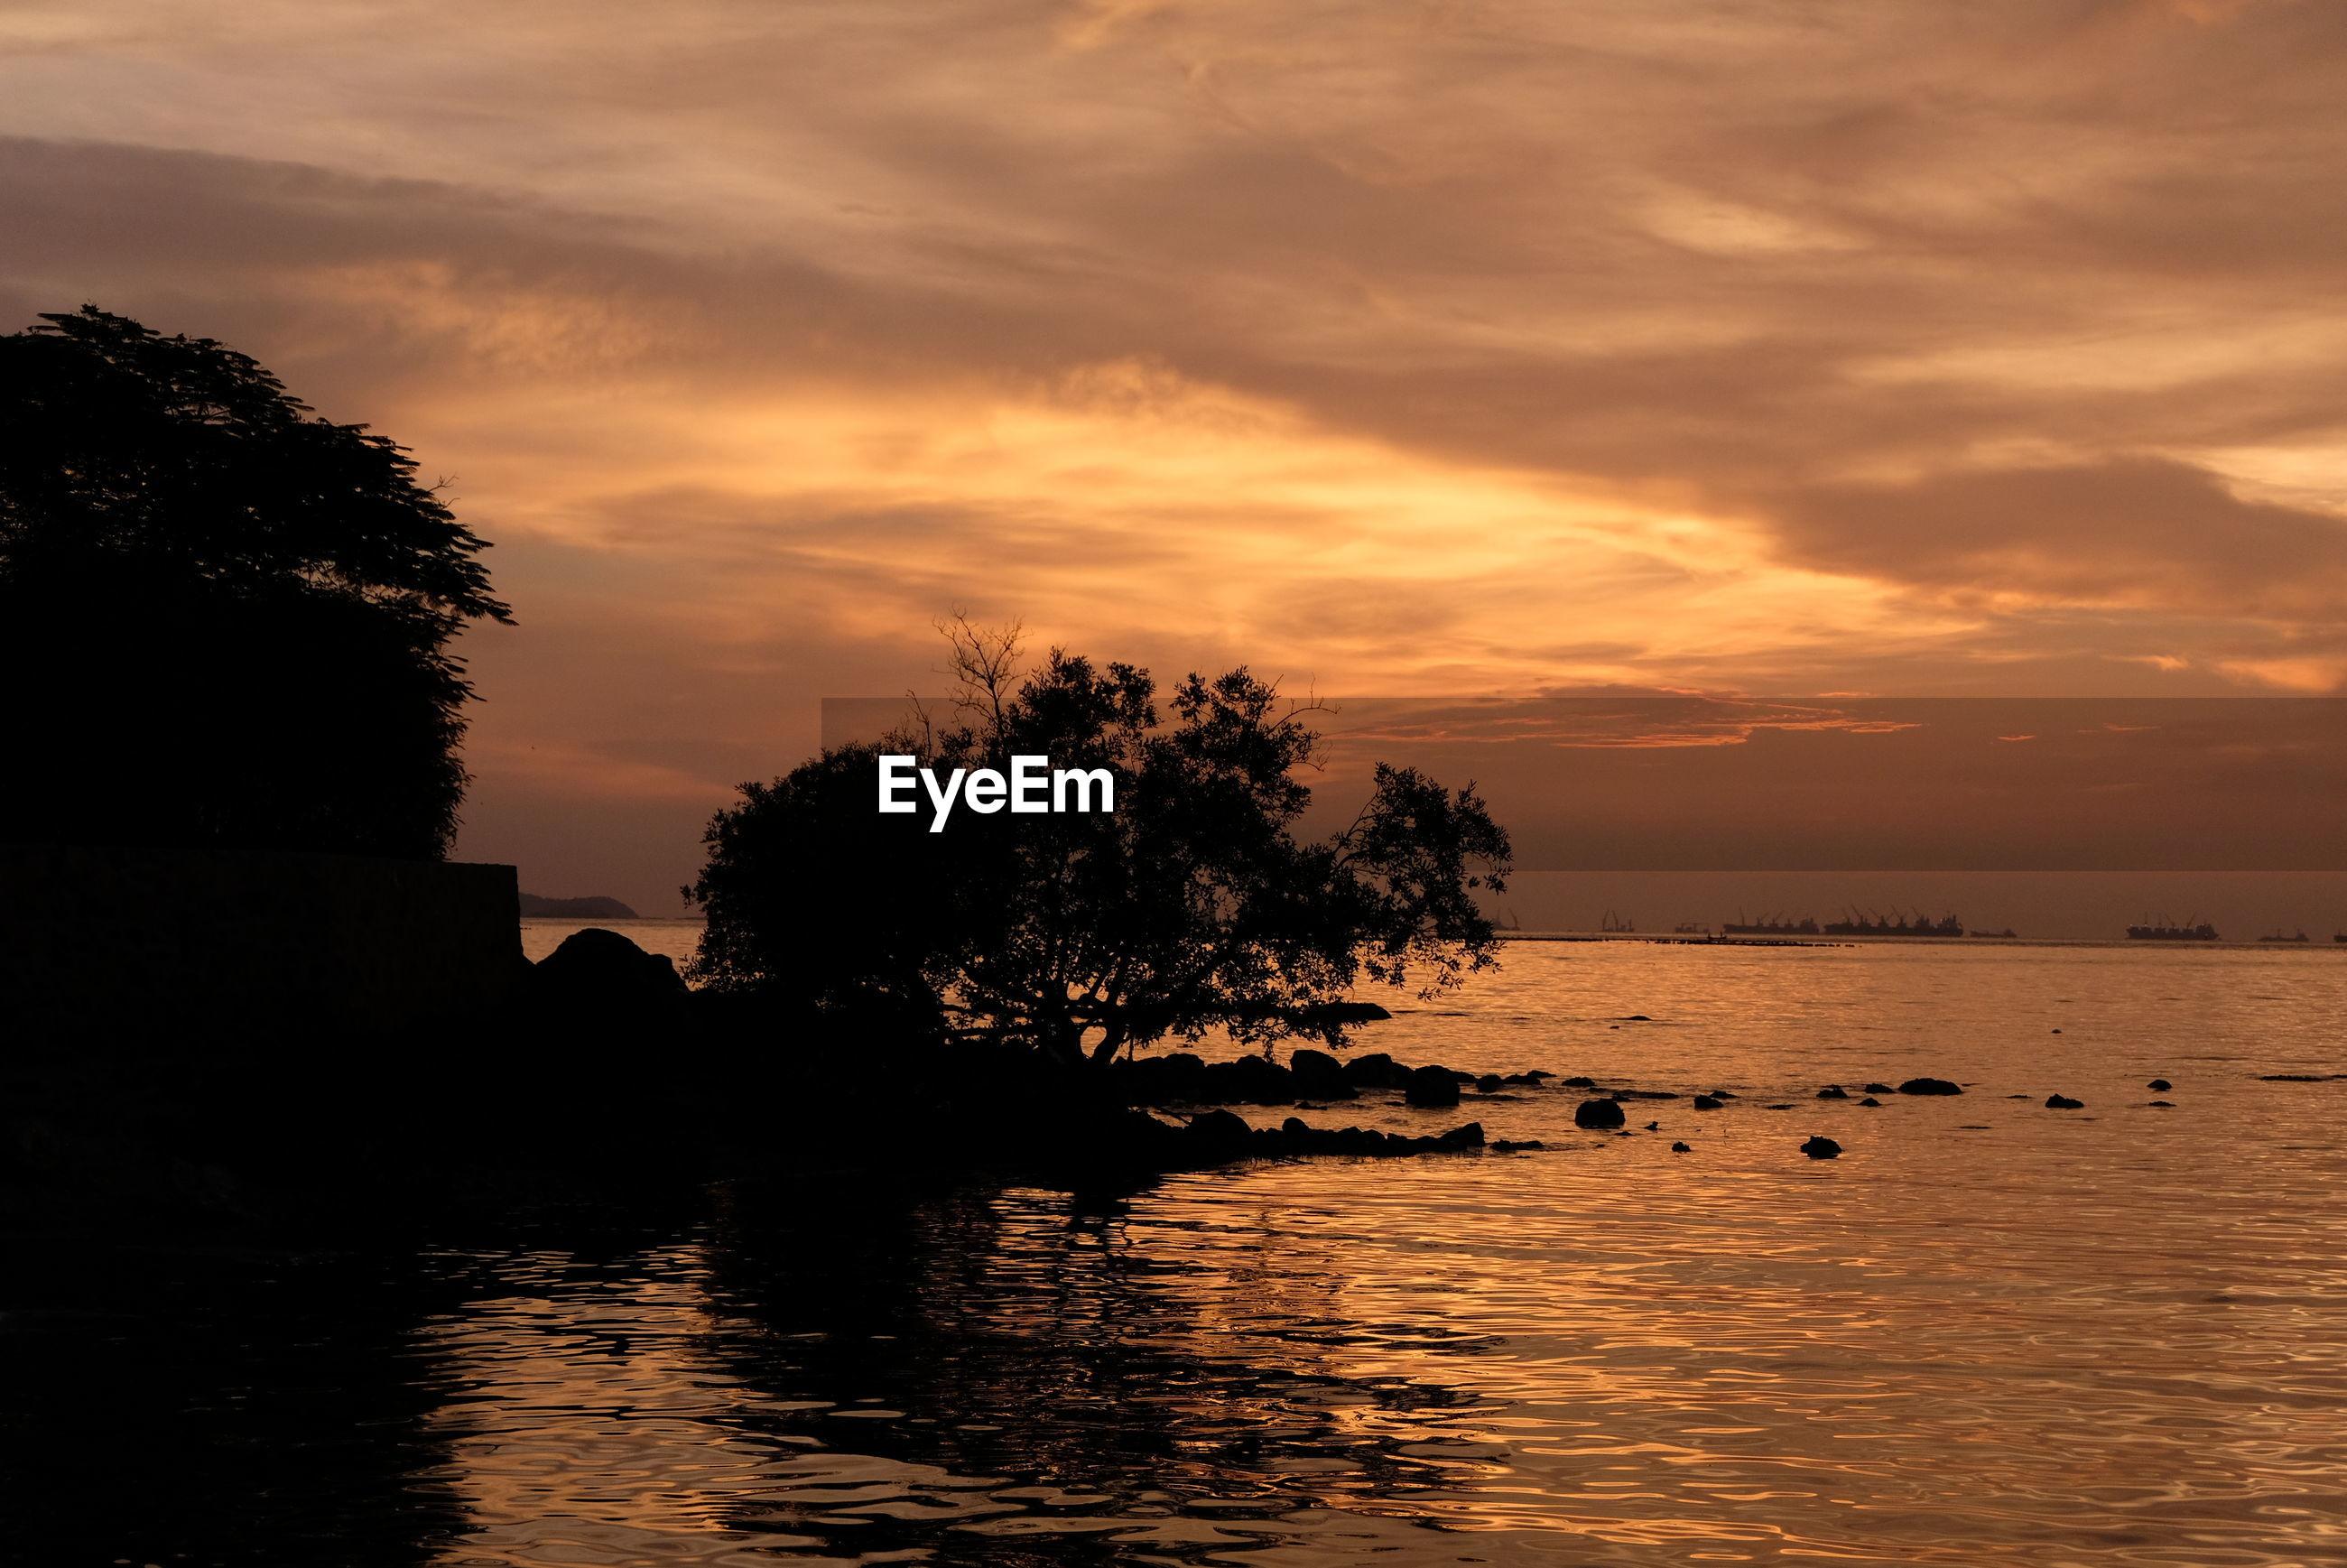 Silhouette tree by sea against orange sky